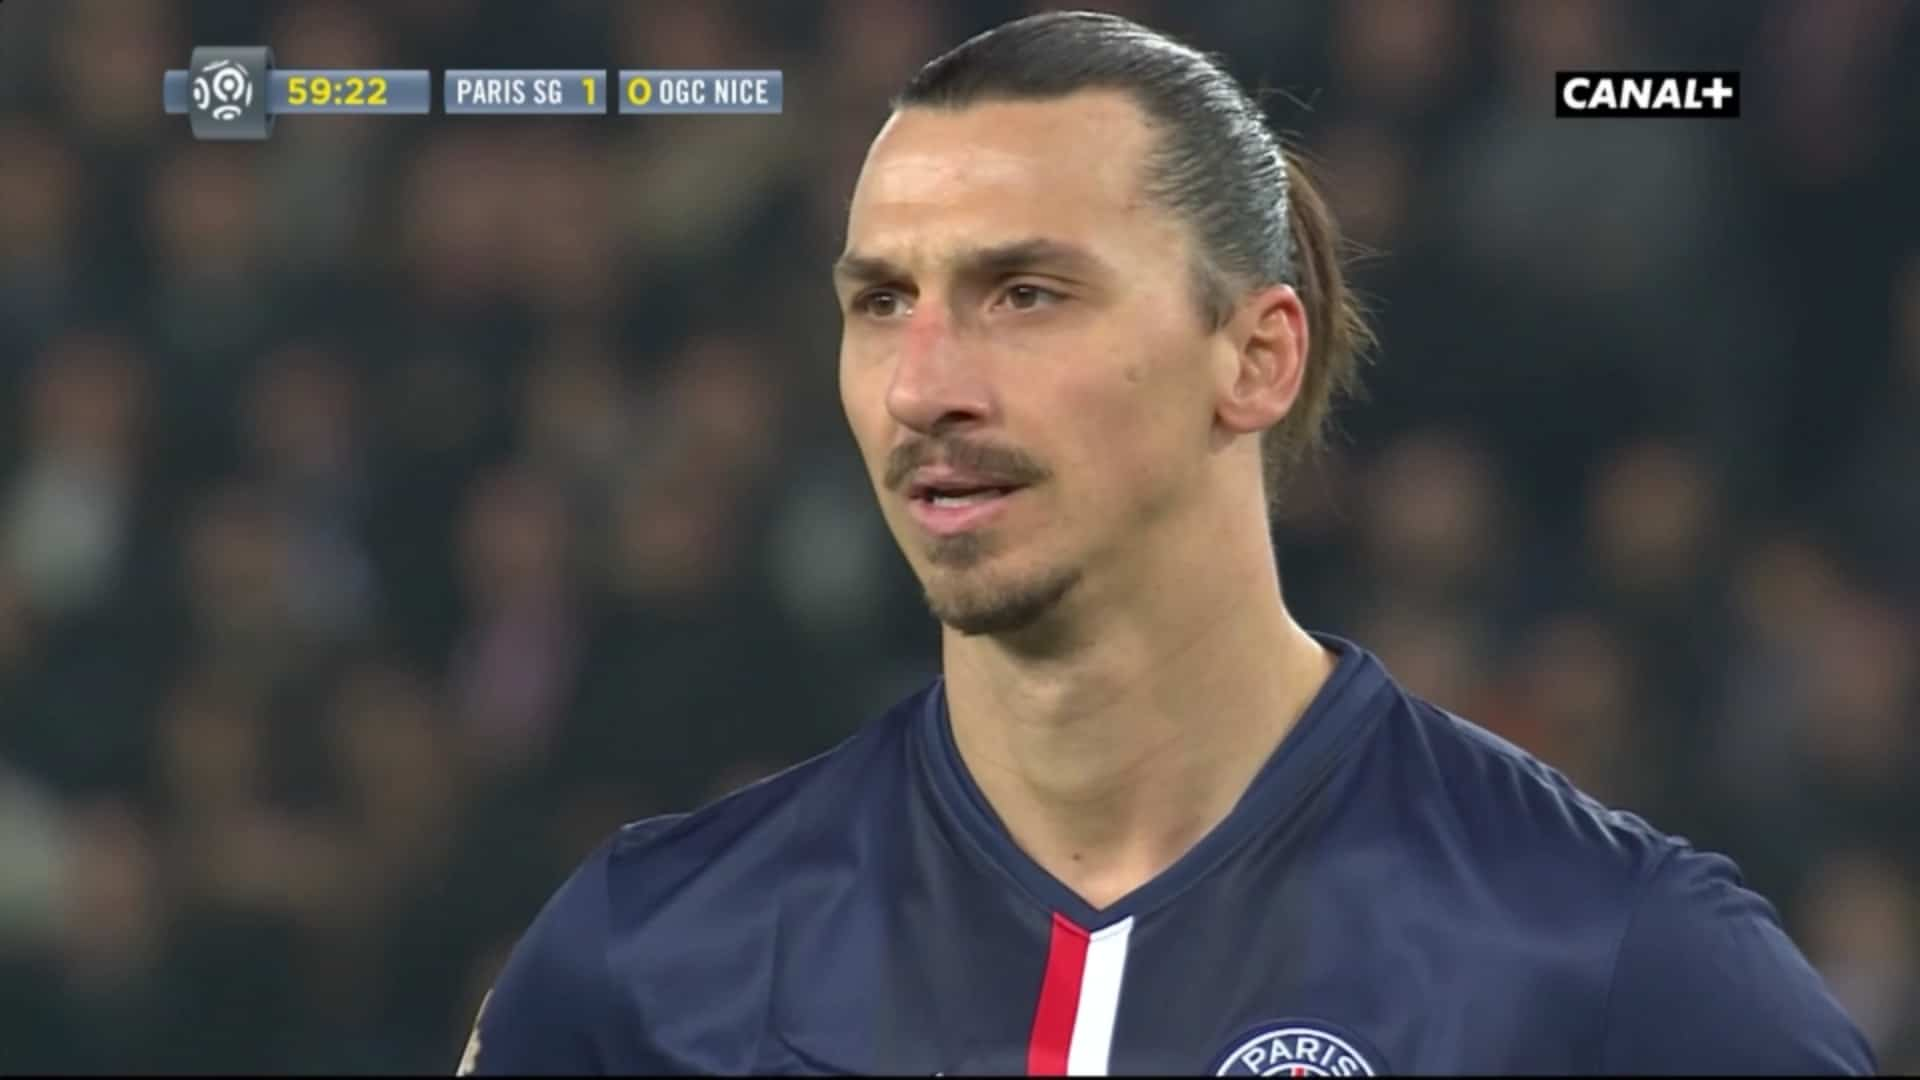 Zlatan Ibrahimović lors du match PSG - Nice du 29 novembre 2014